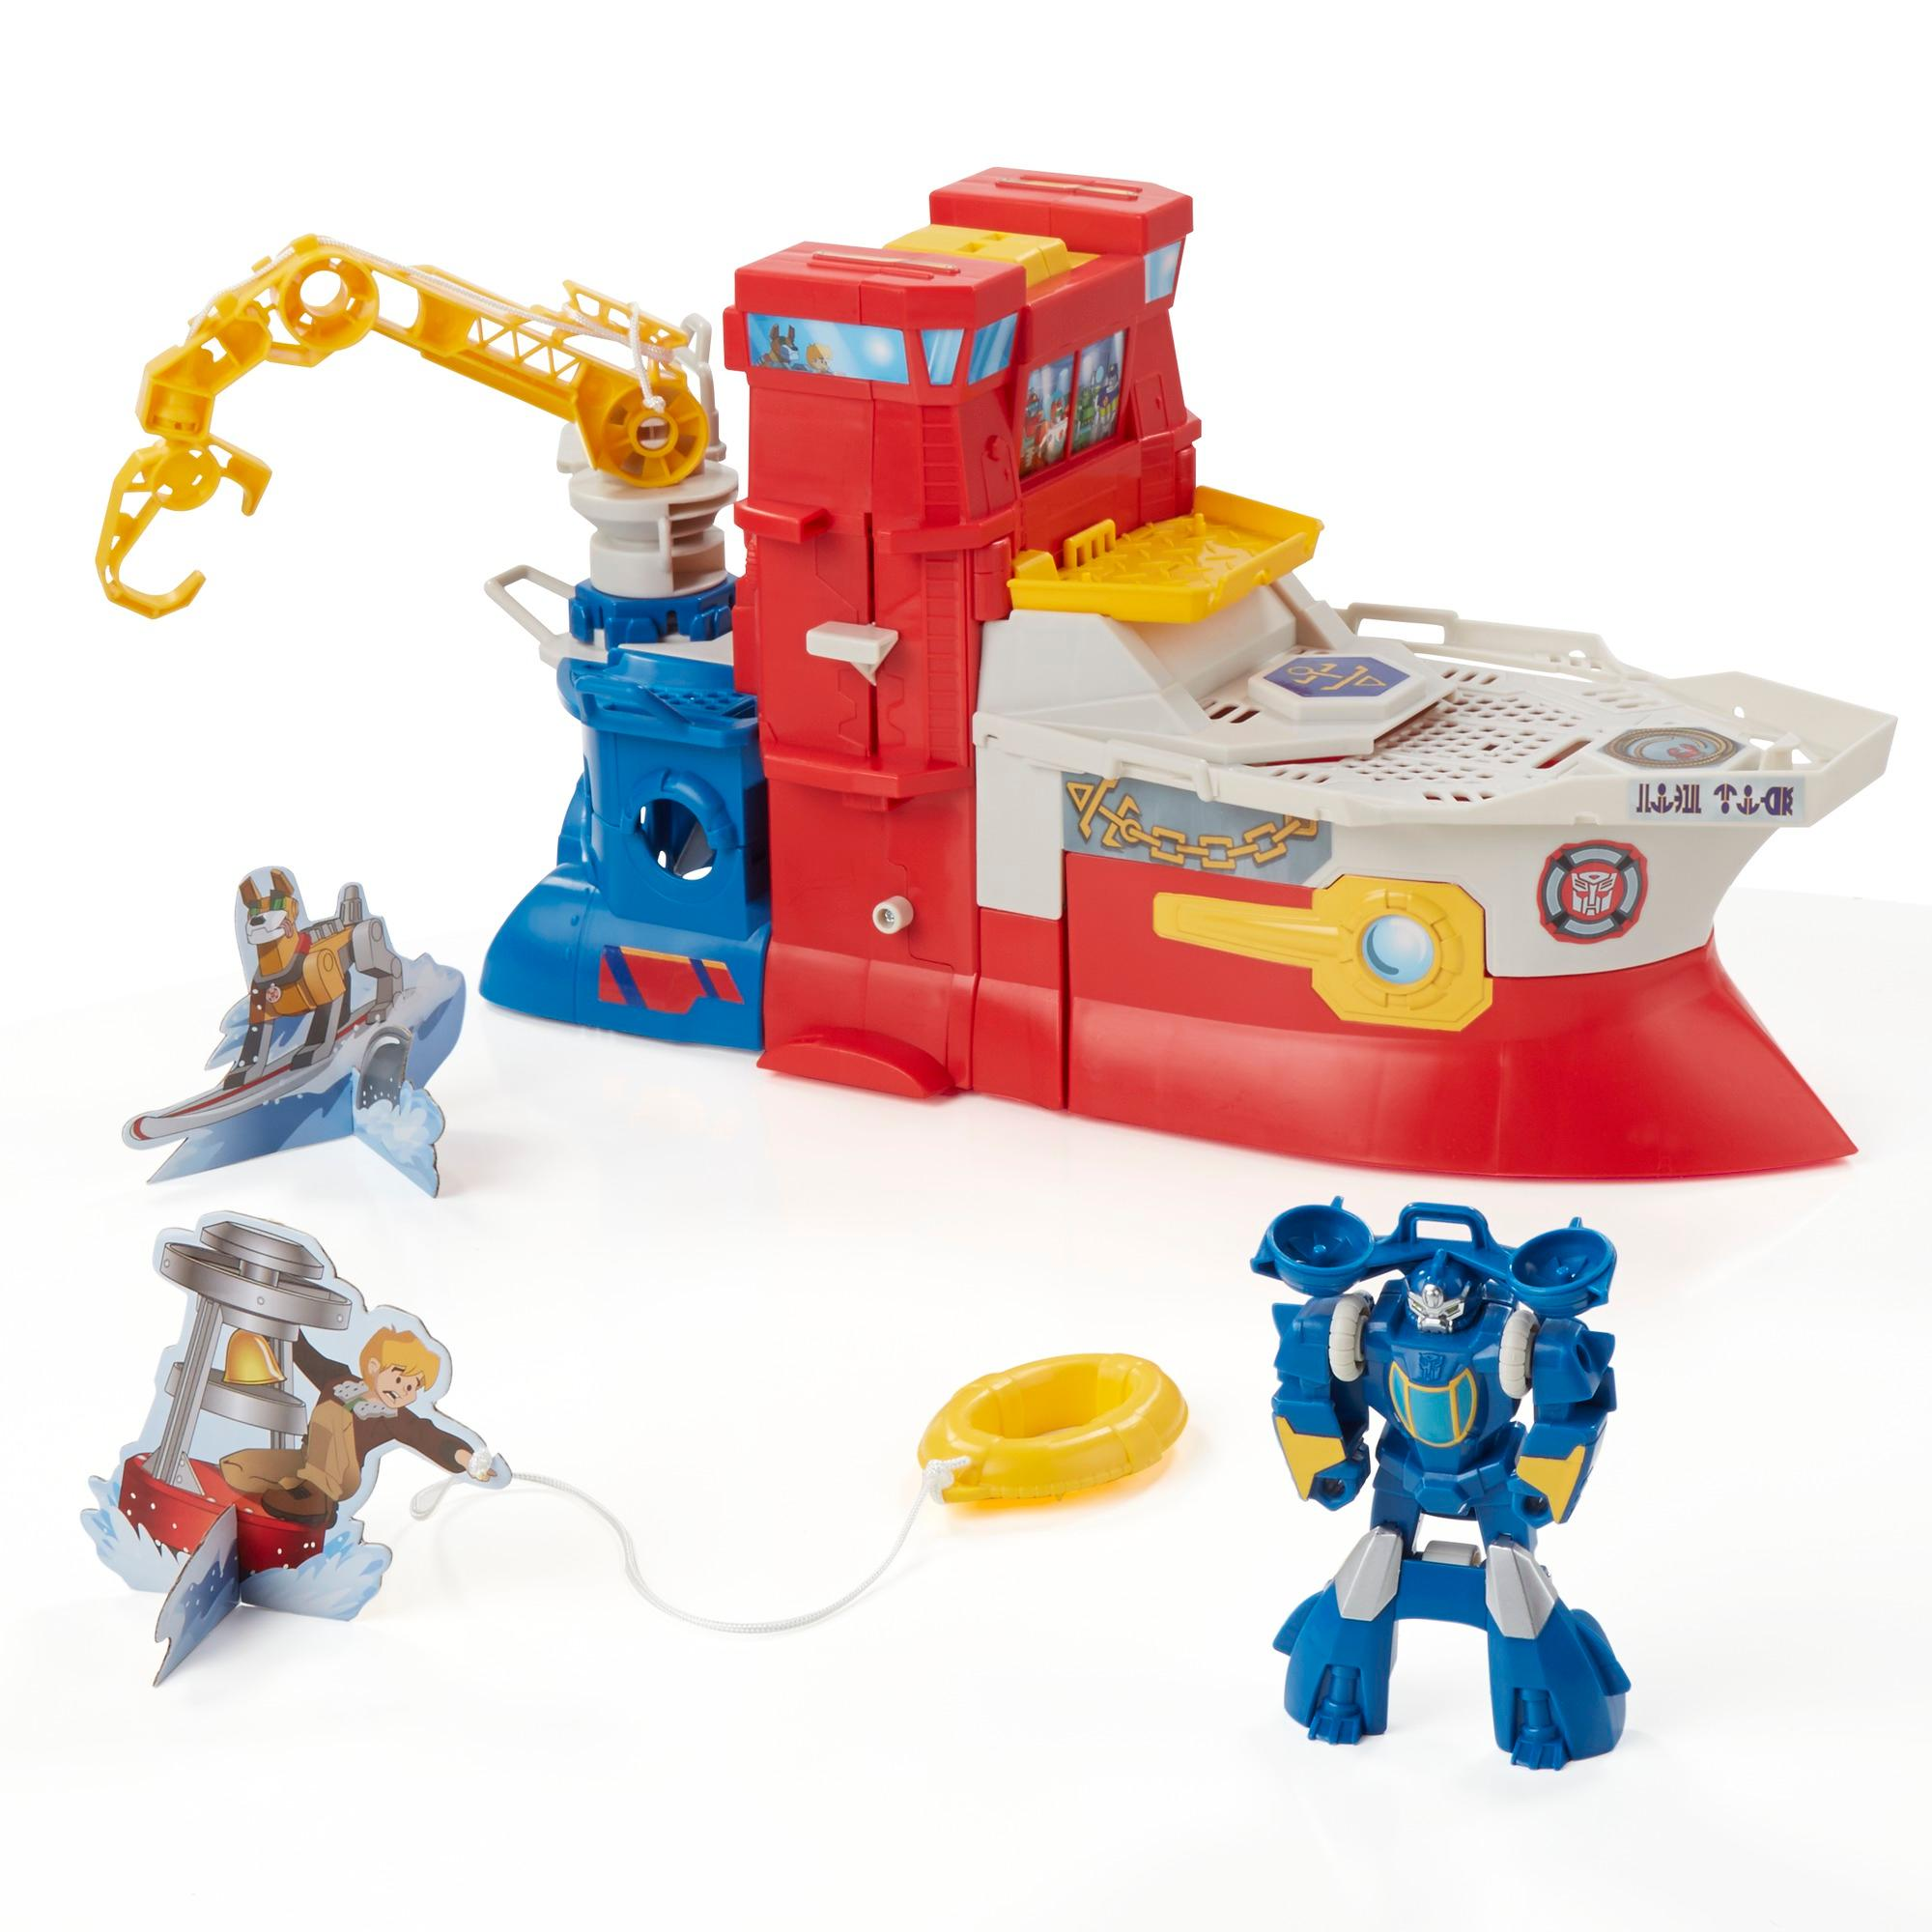 Transformer Dog Toy